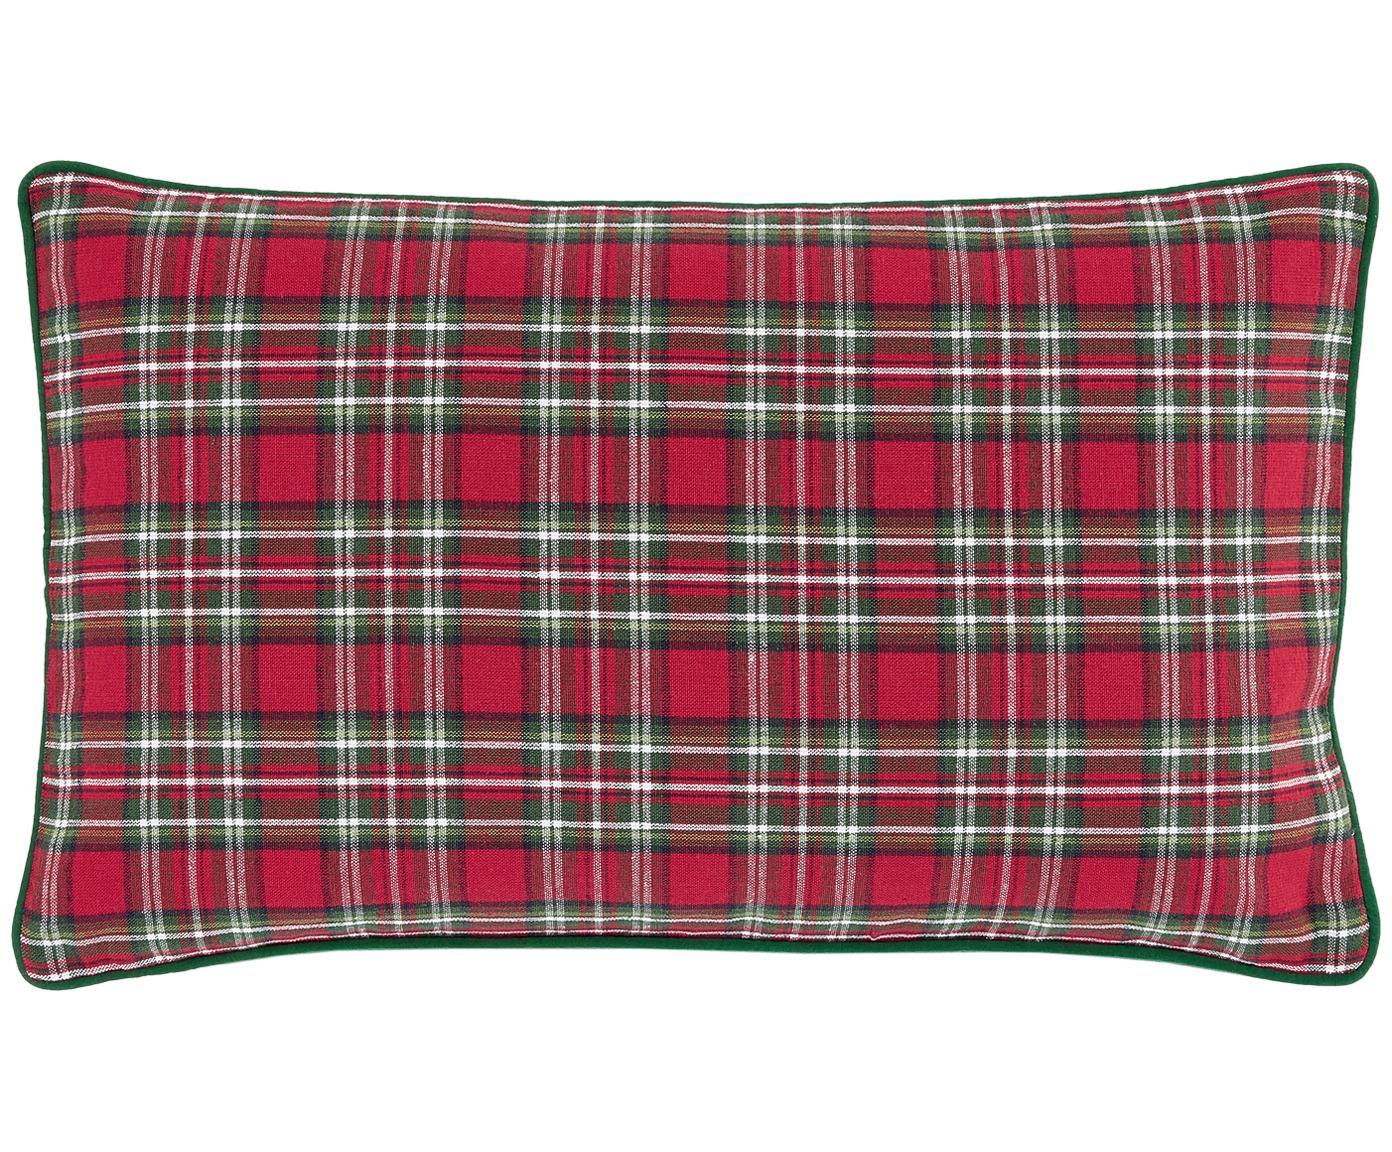 Kussenhoes Tartan, 100% katoen, Rood, donkergroen, 30 x 50 cm